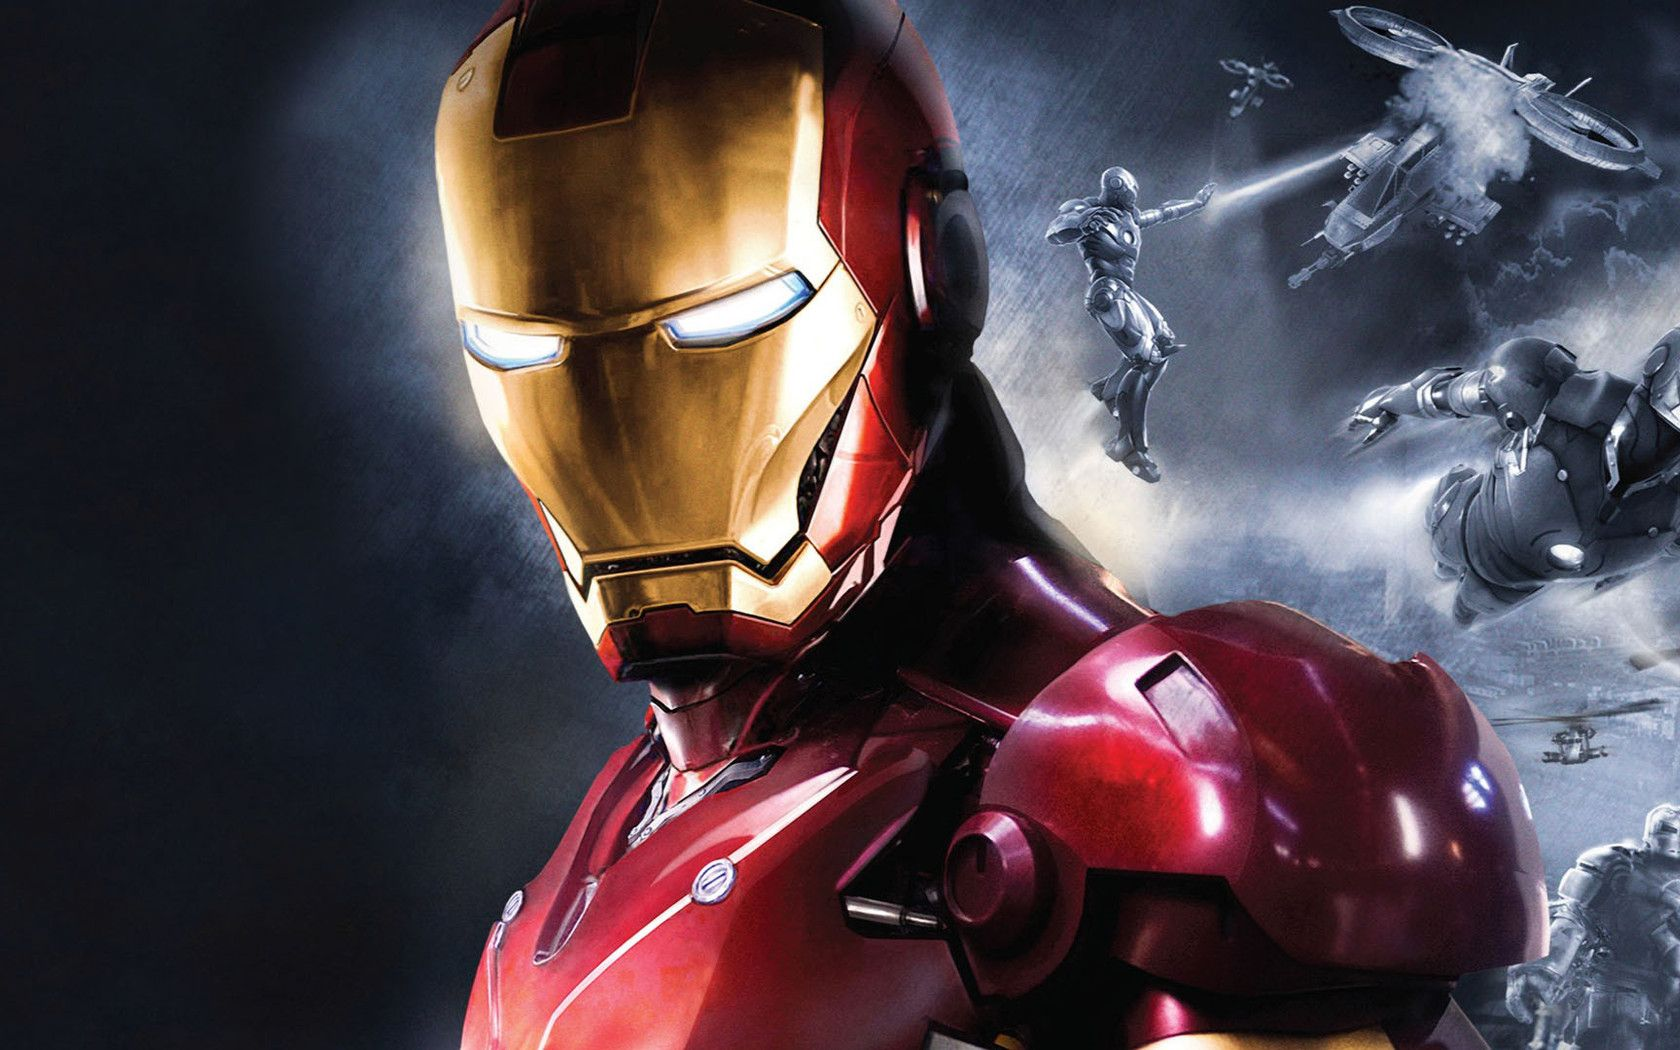 Windows 10 Hero Wallpaper Animated Wallpapersafari Iron Man Wallpaper Iron Man Art Iron Man Avengers